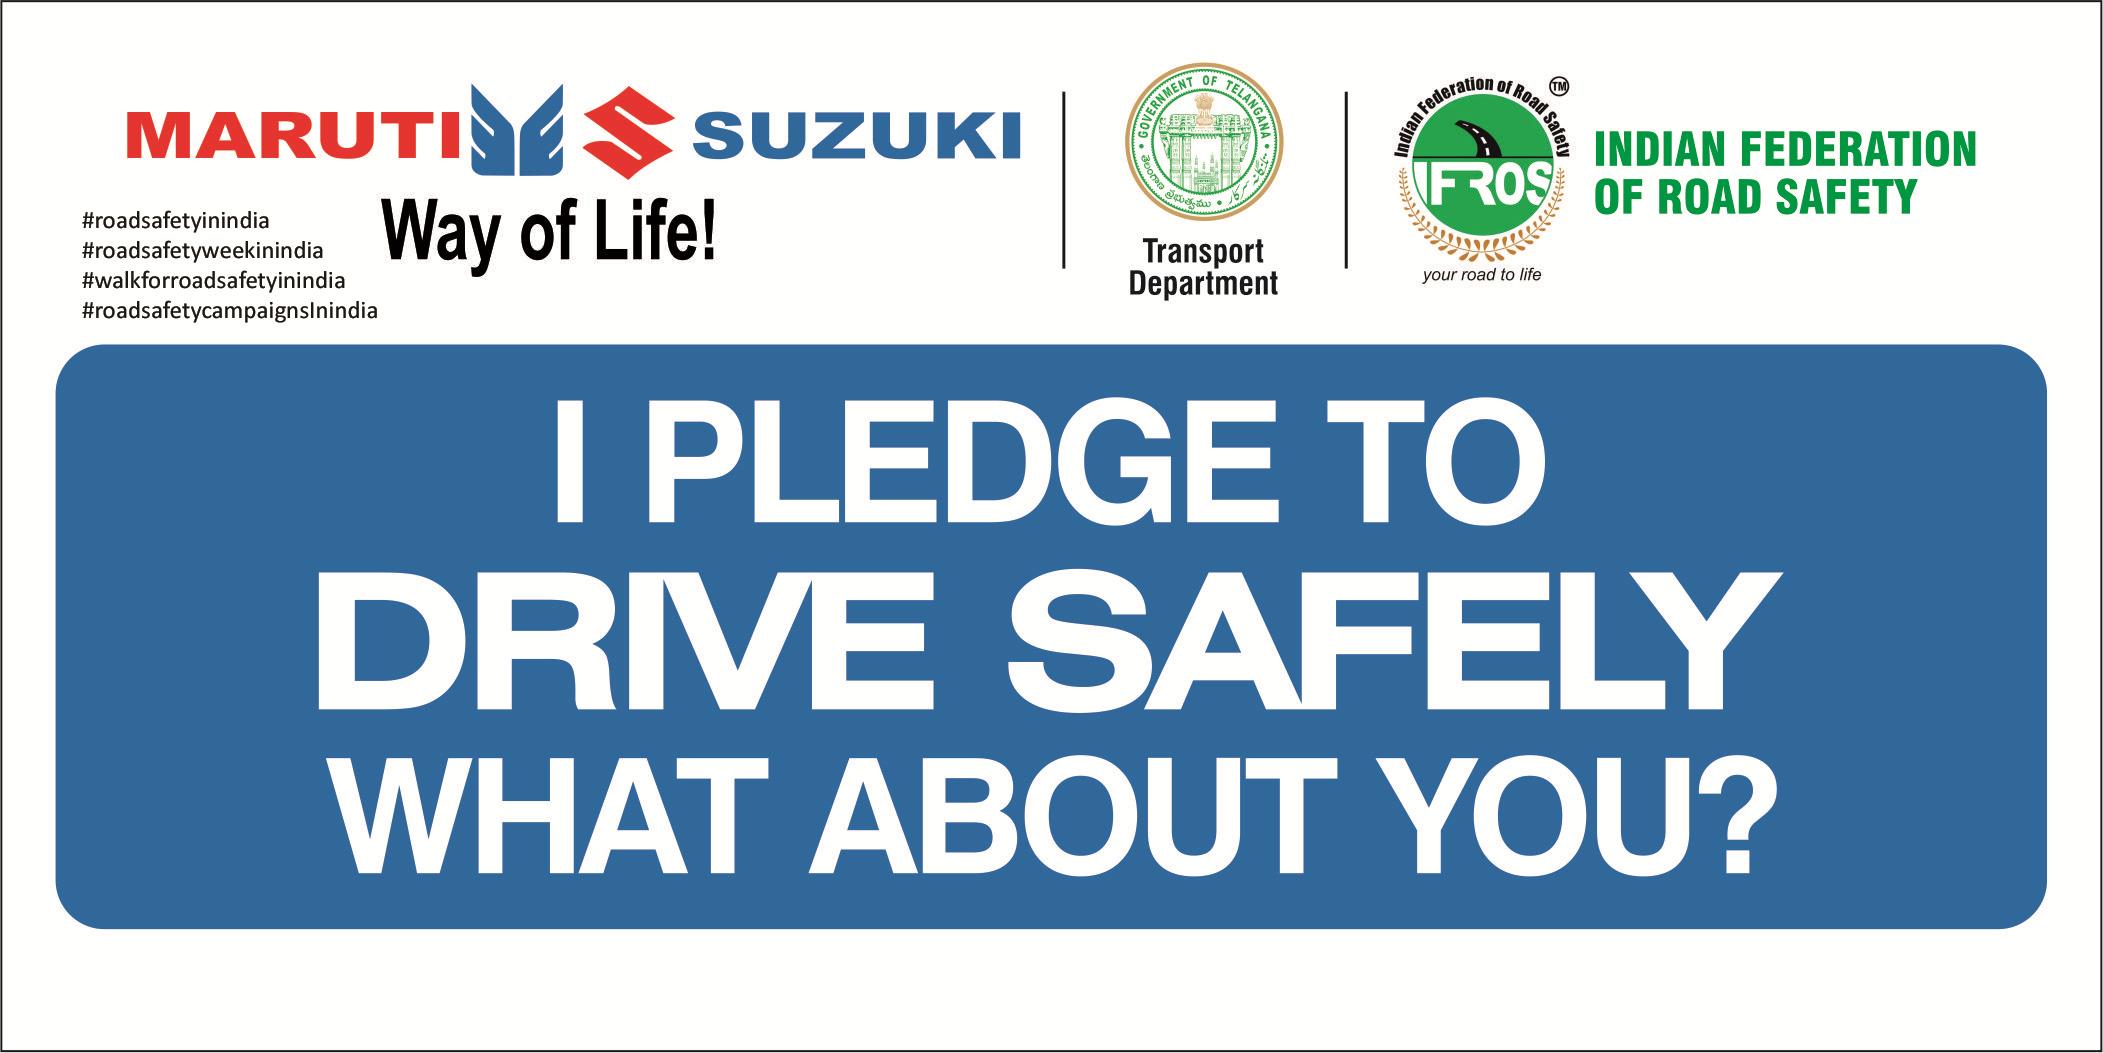 roadsafetypledgeinindia Road safety pledge must